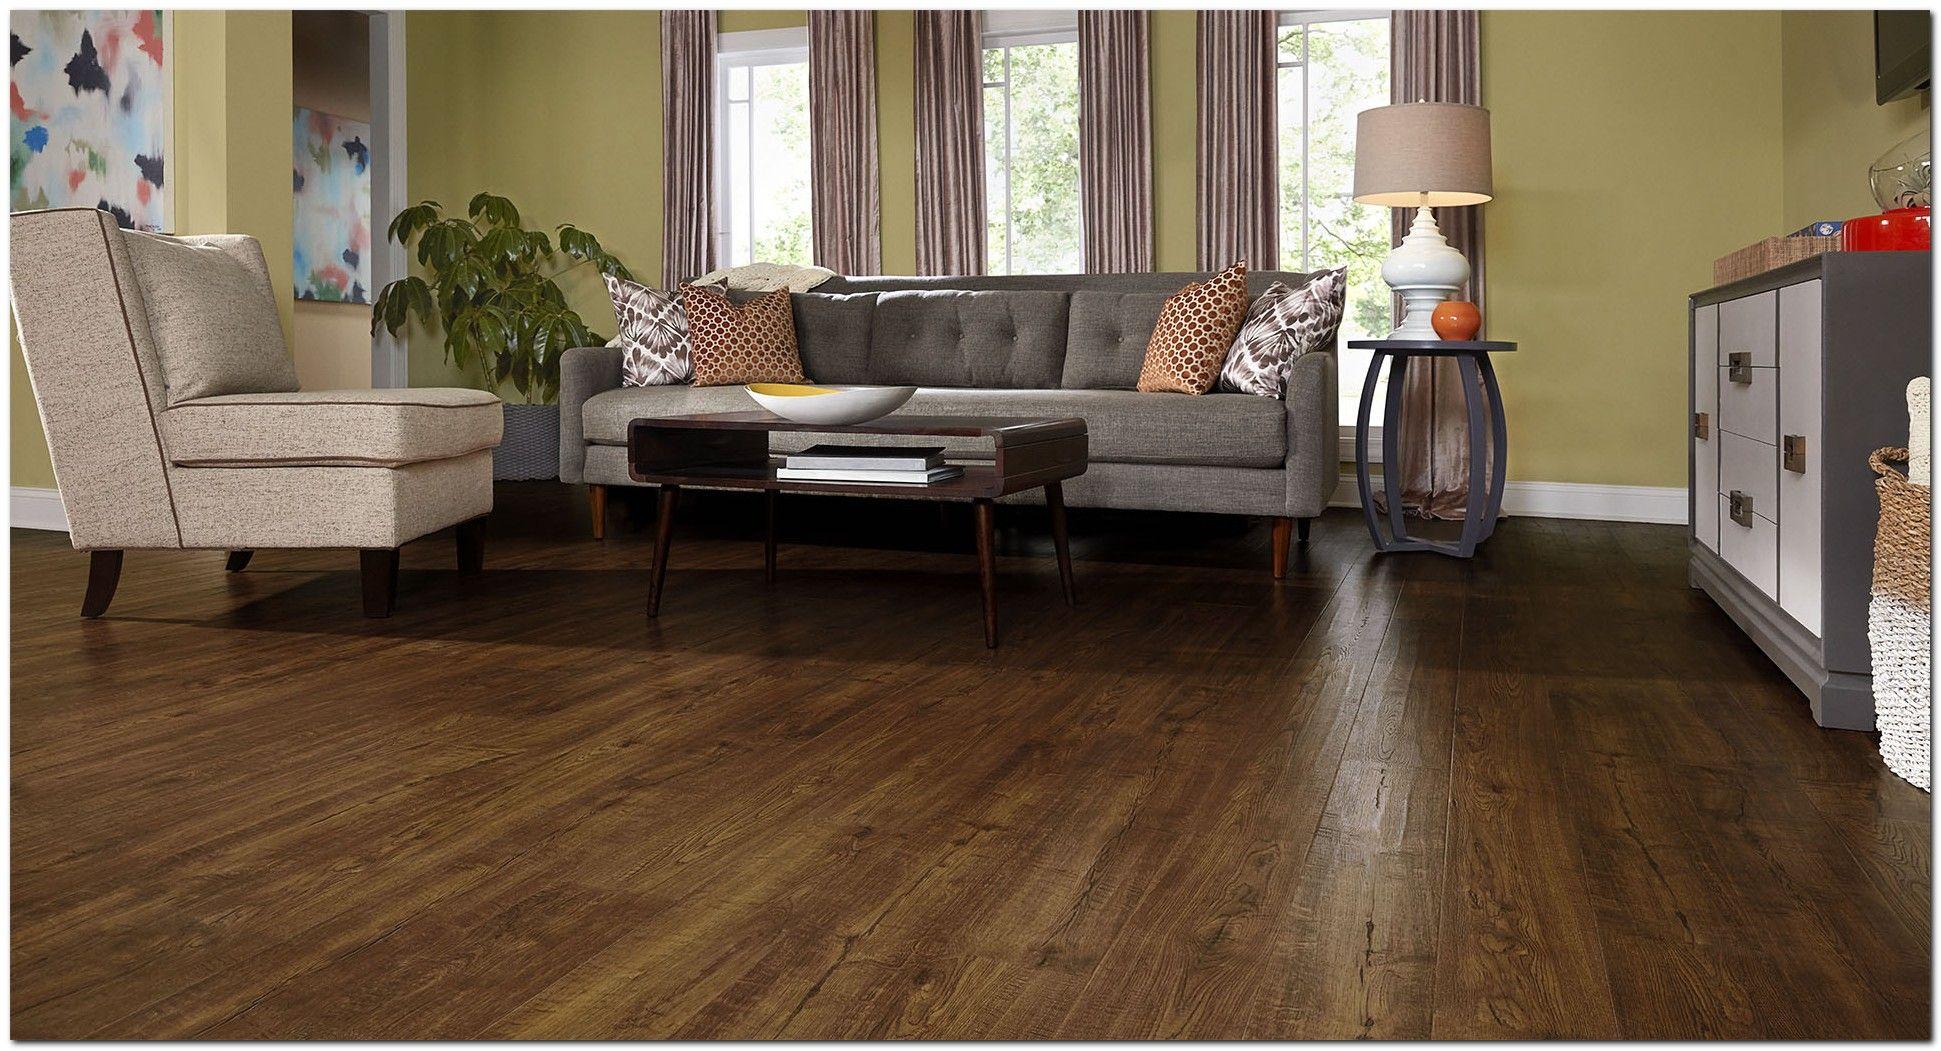 70 Ideas Cozy Living Room With Laminate Floor The U